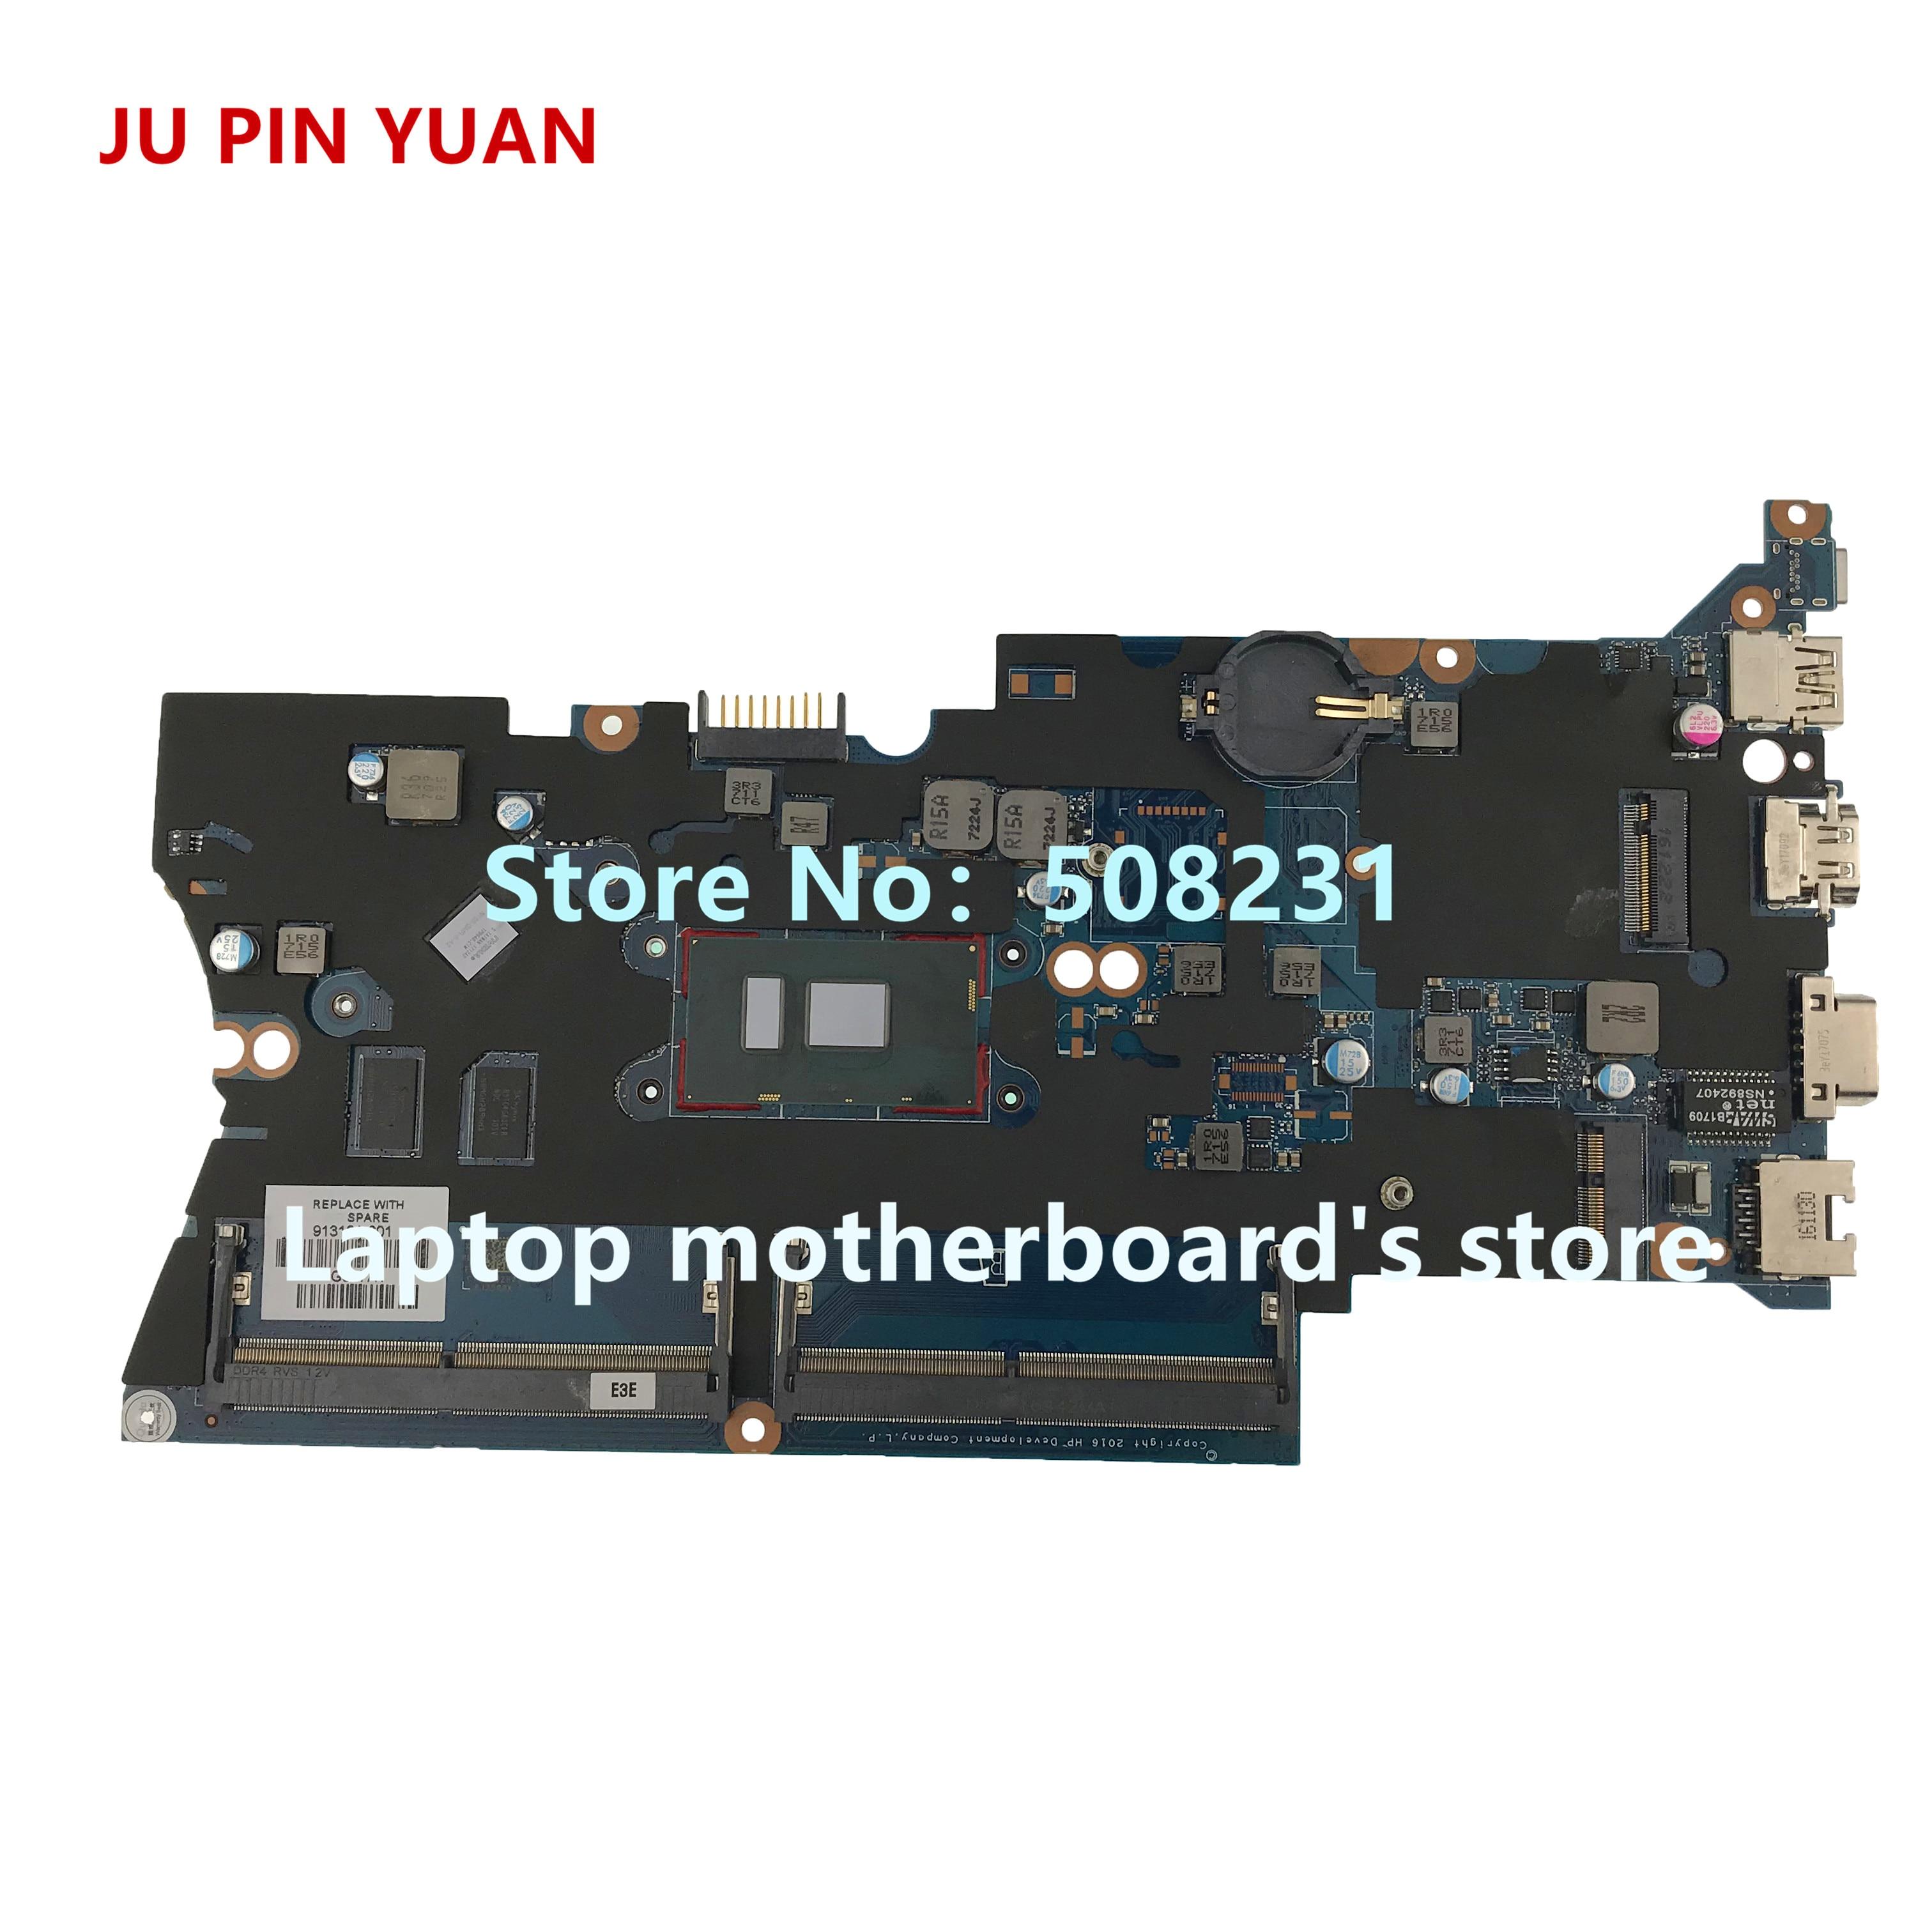 JU PIN YUAN  913101-601 913101-001 DA0X81MB6E0 Laptop motherboard For HP ProBook 430 G4 440 G4 Notebook PC I7-7500U fully TestedJU PIN YUAN  913101-601 913101-001 DA0X81MB6E0 Laptop motherboard For HP ProBook 430 G4 440 G4 Notebook PC I7-7500U fully Tested